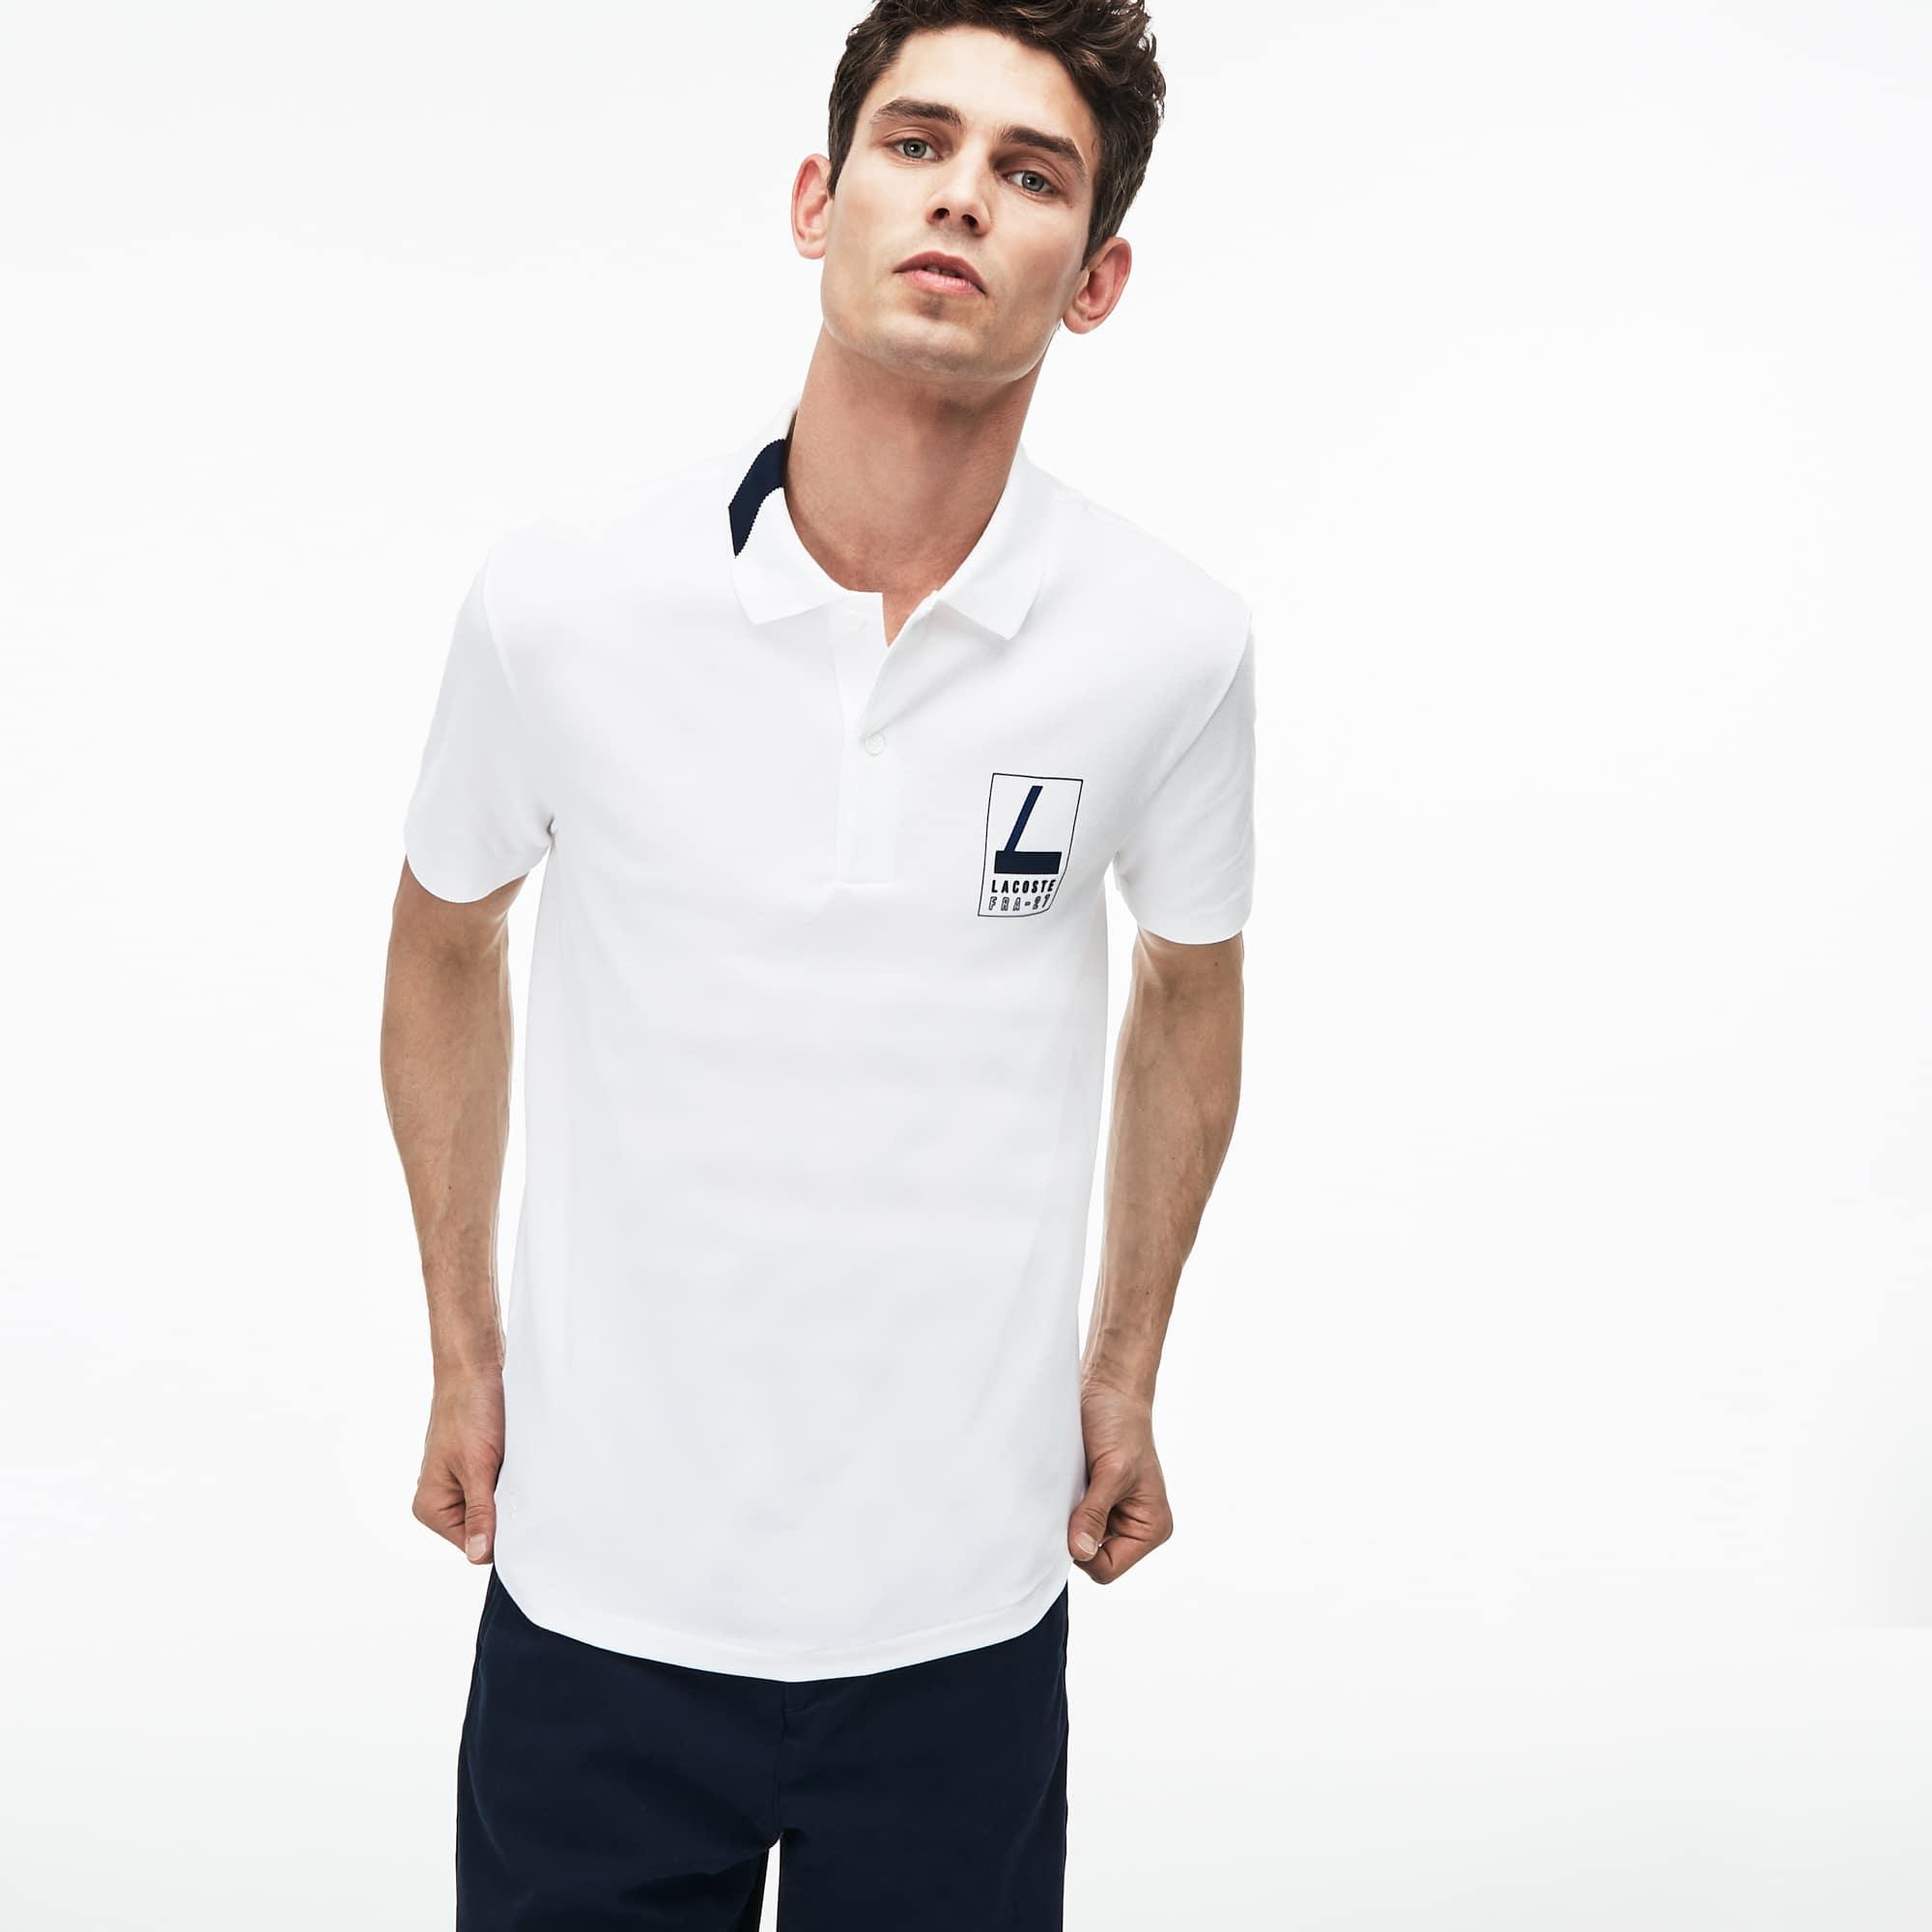 Camisas polo para homens 3b4cbfe4bdbb5